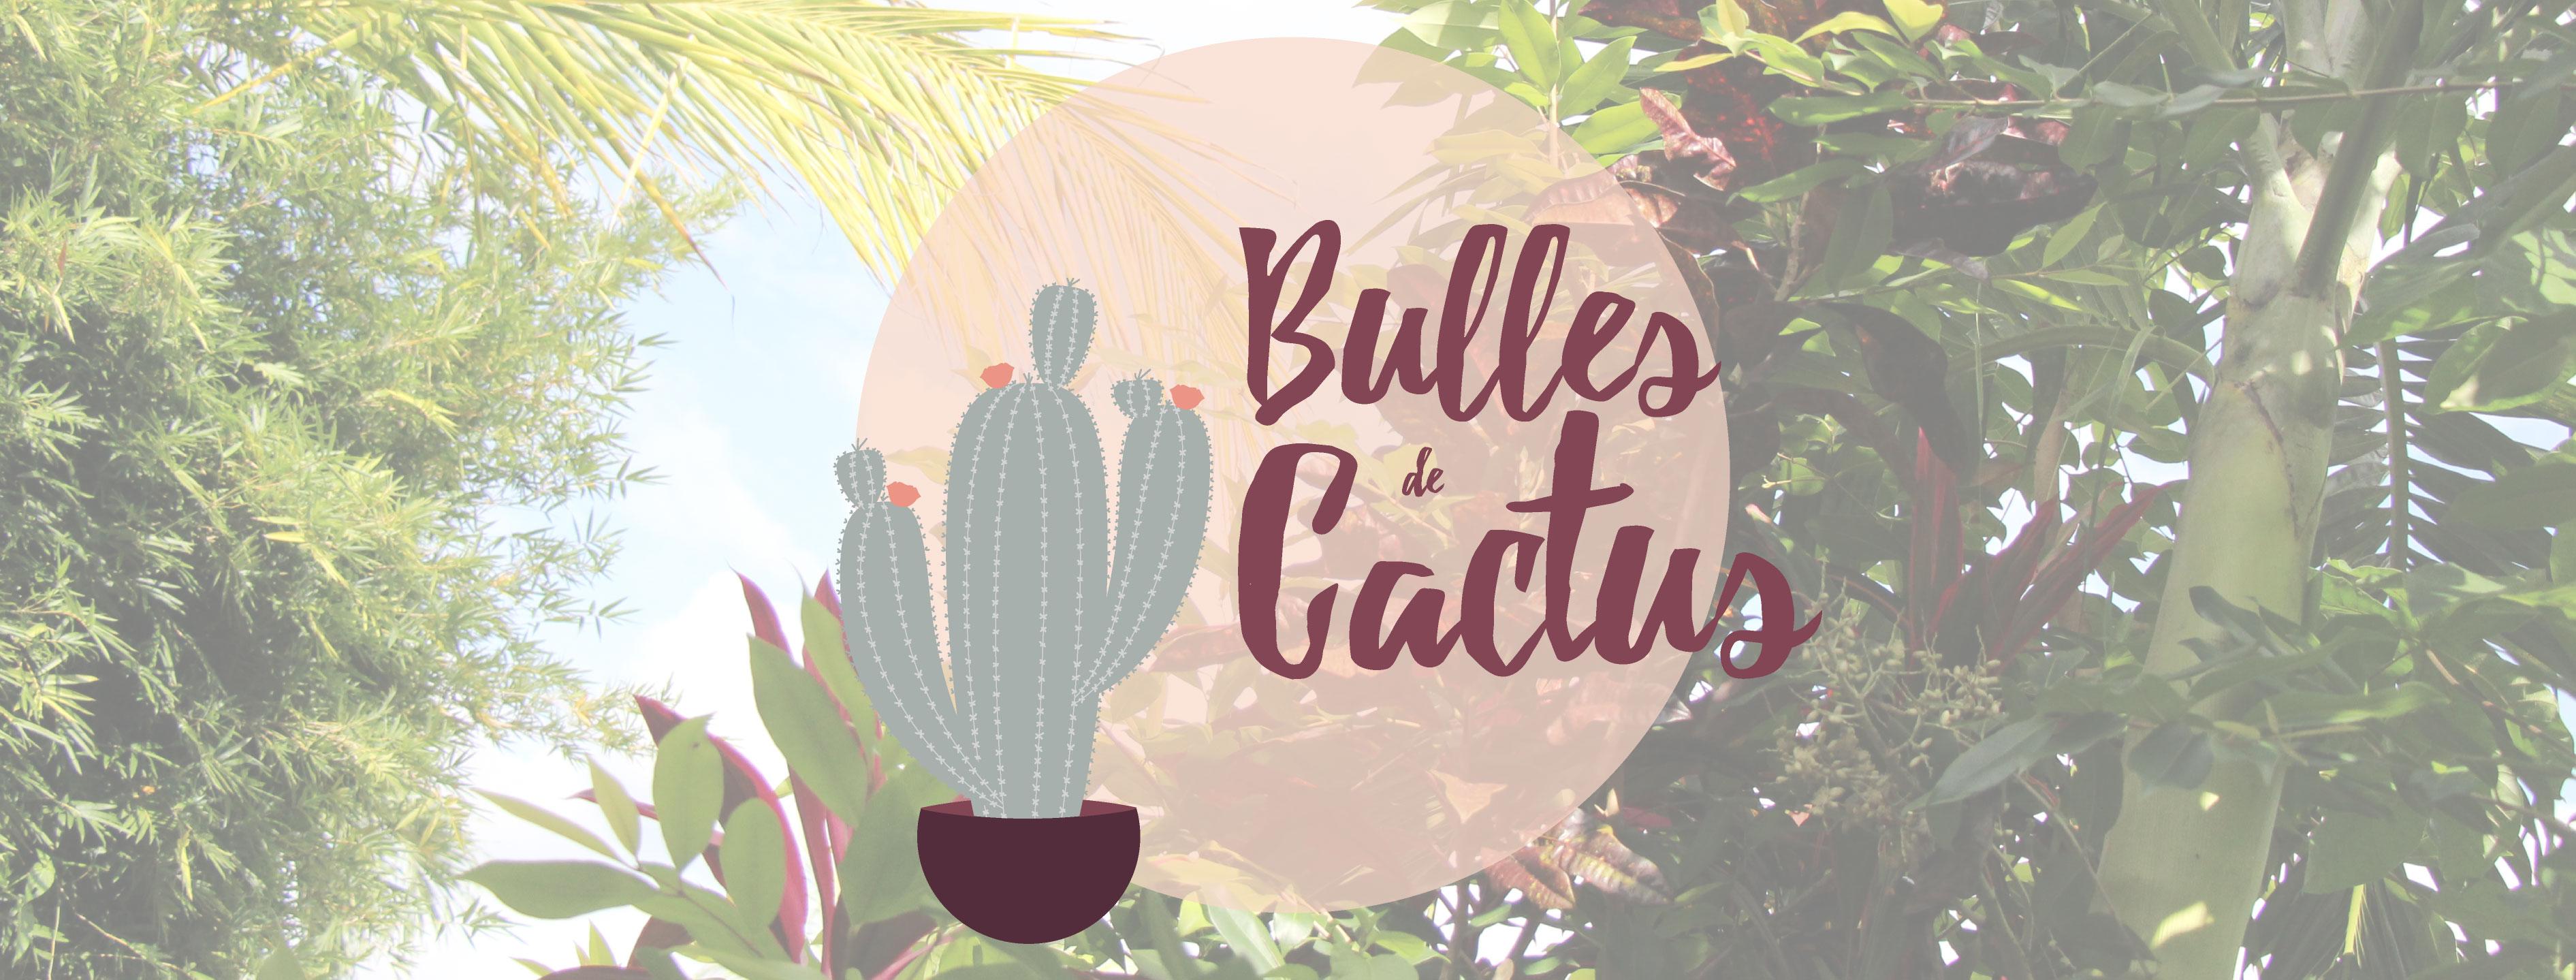 Bulles de Cactus